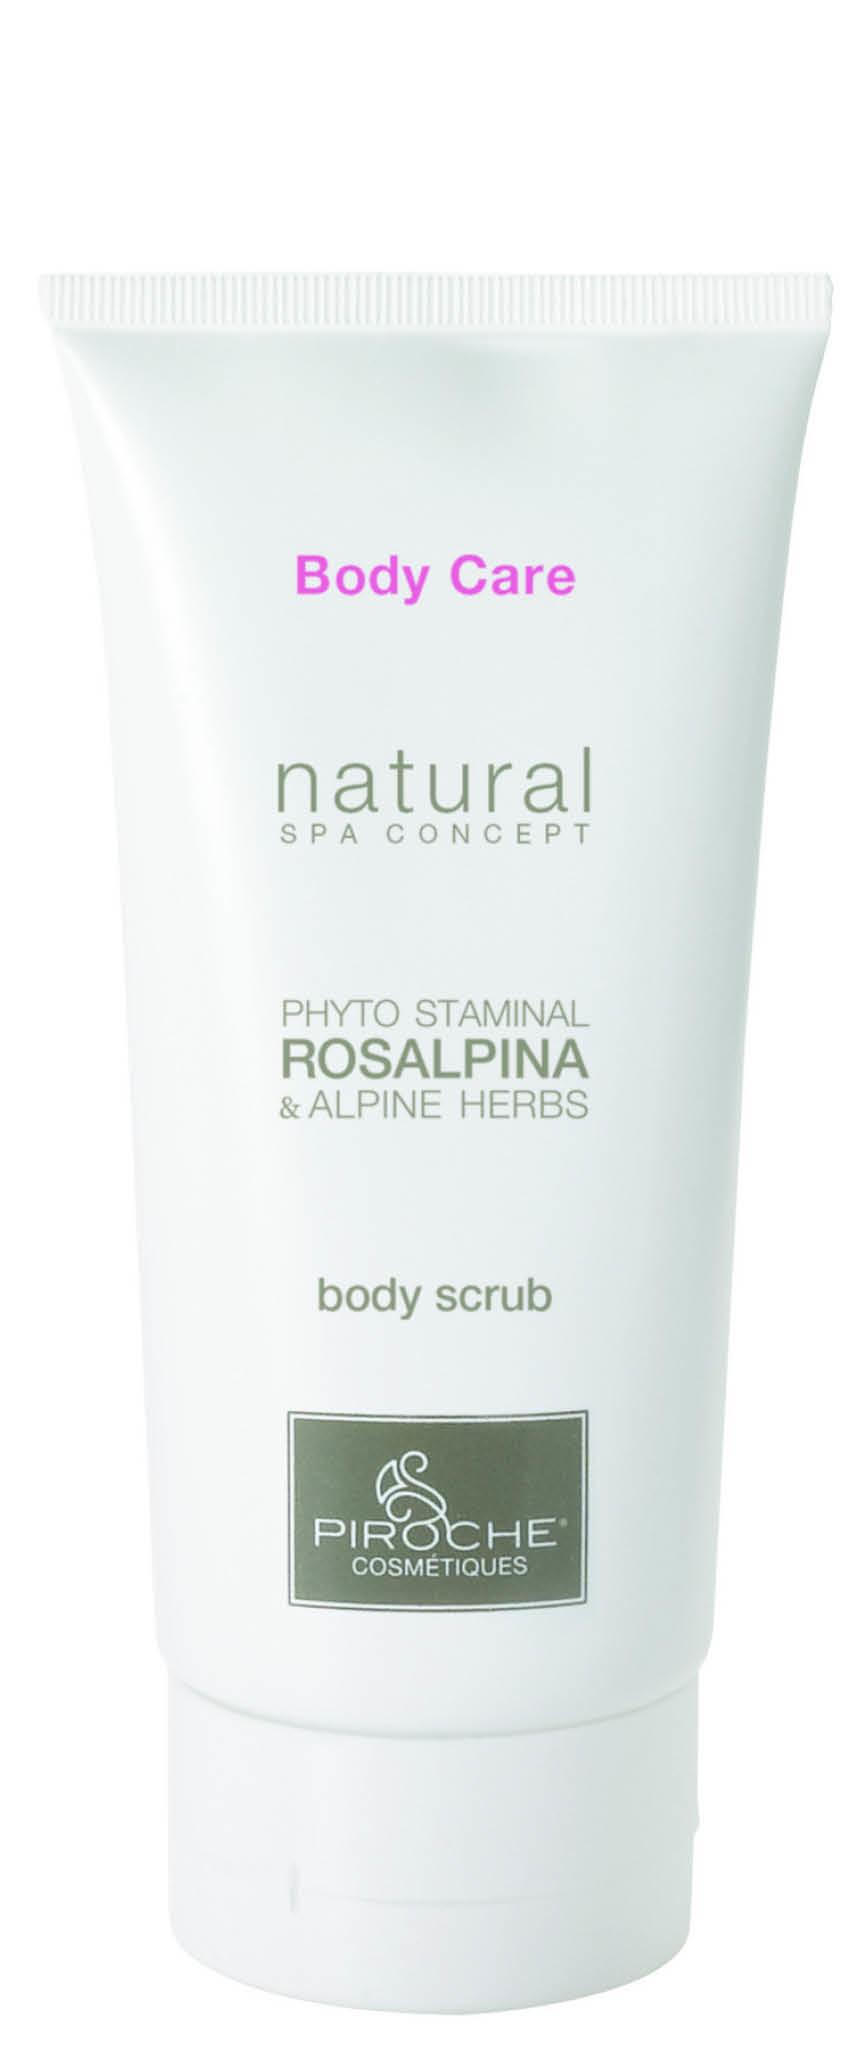 Body scrub Rosalpina piroche